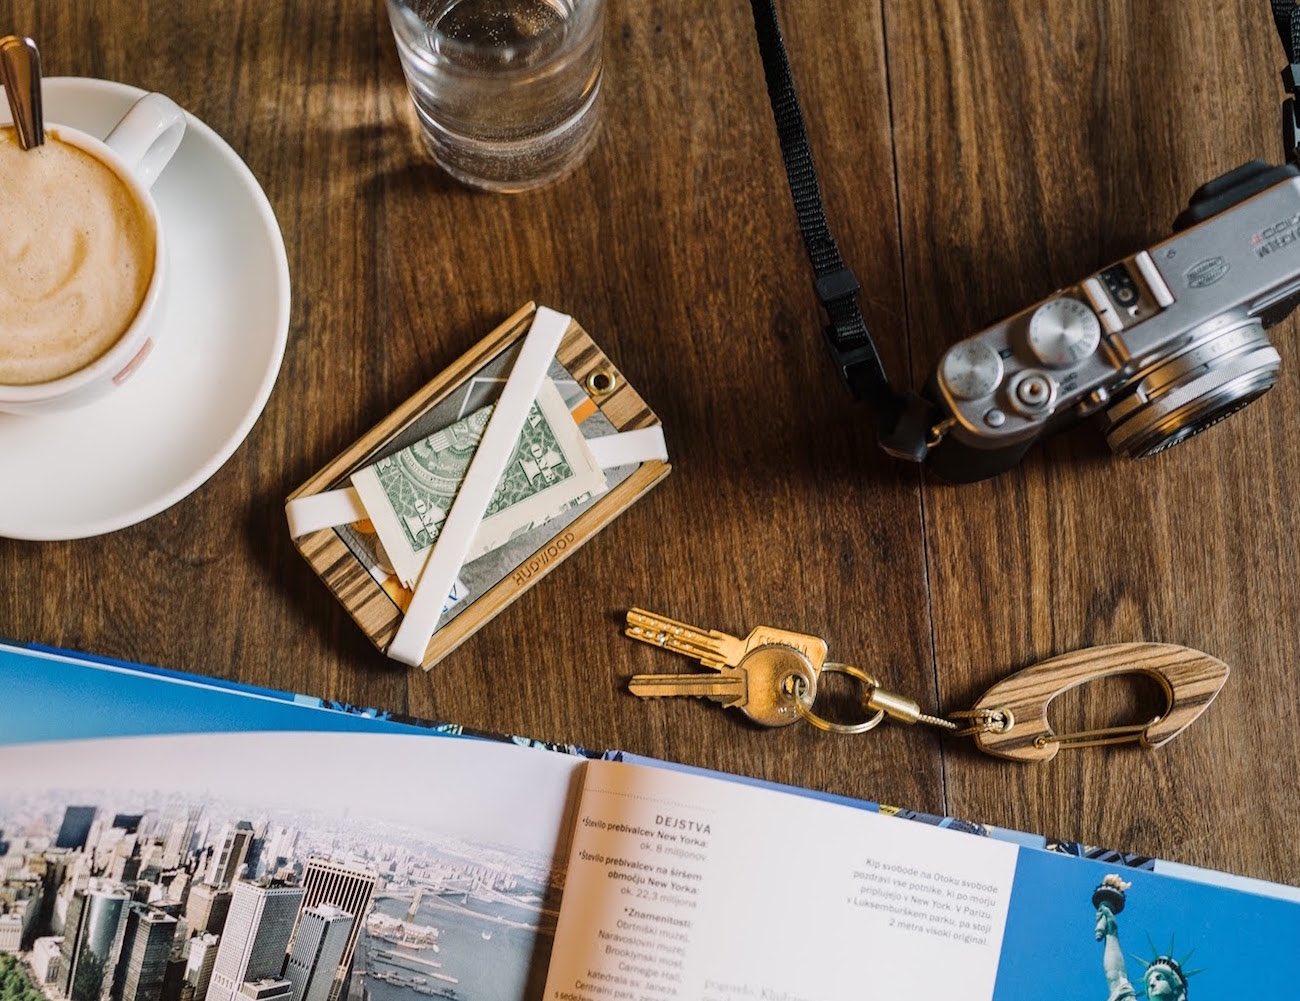 Hudwood+%26%238211%3B+Wooden+Carabiners+And+Wallet